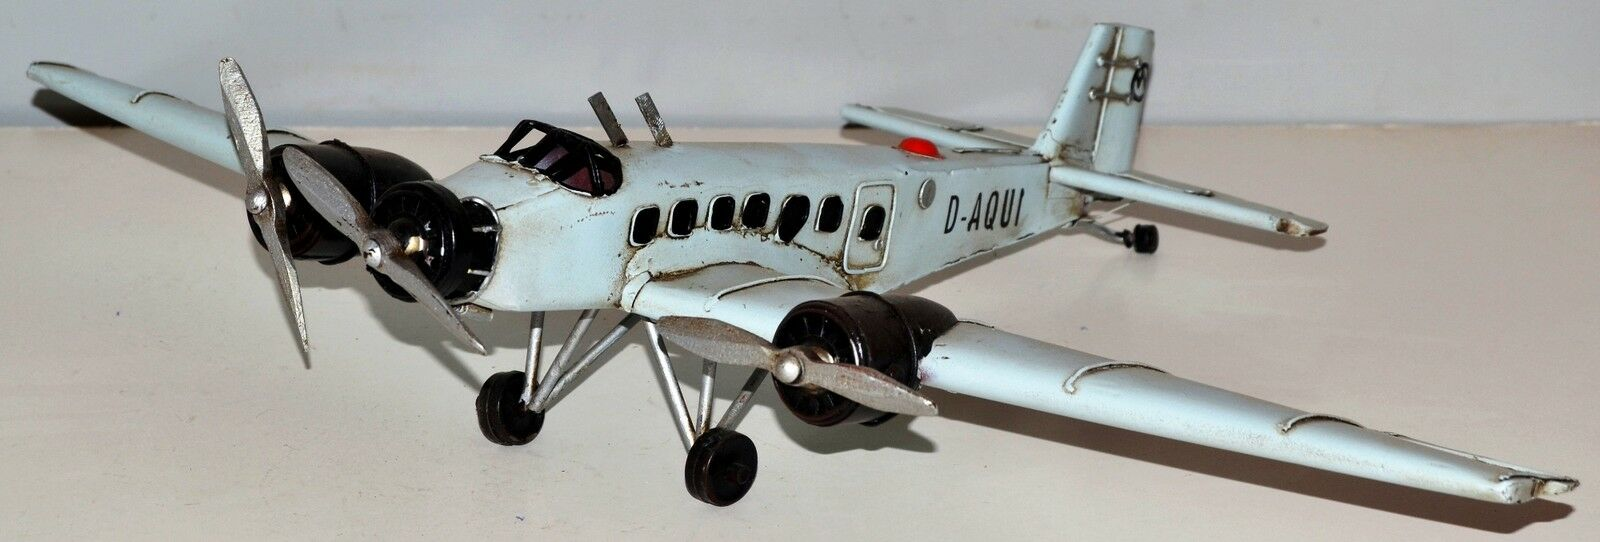 Junkers Ju - 52 1930 Aircraft Sheet Metal Model Tin Vintage Plane 34x52 cm 37230